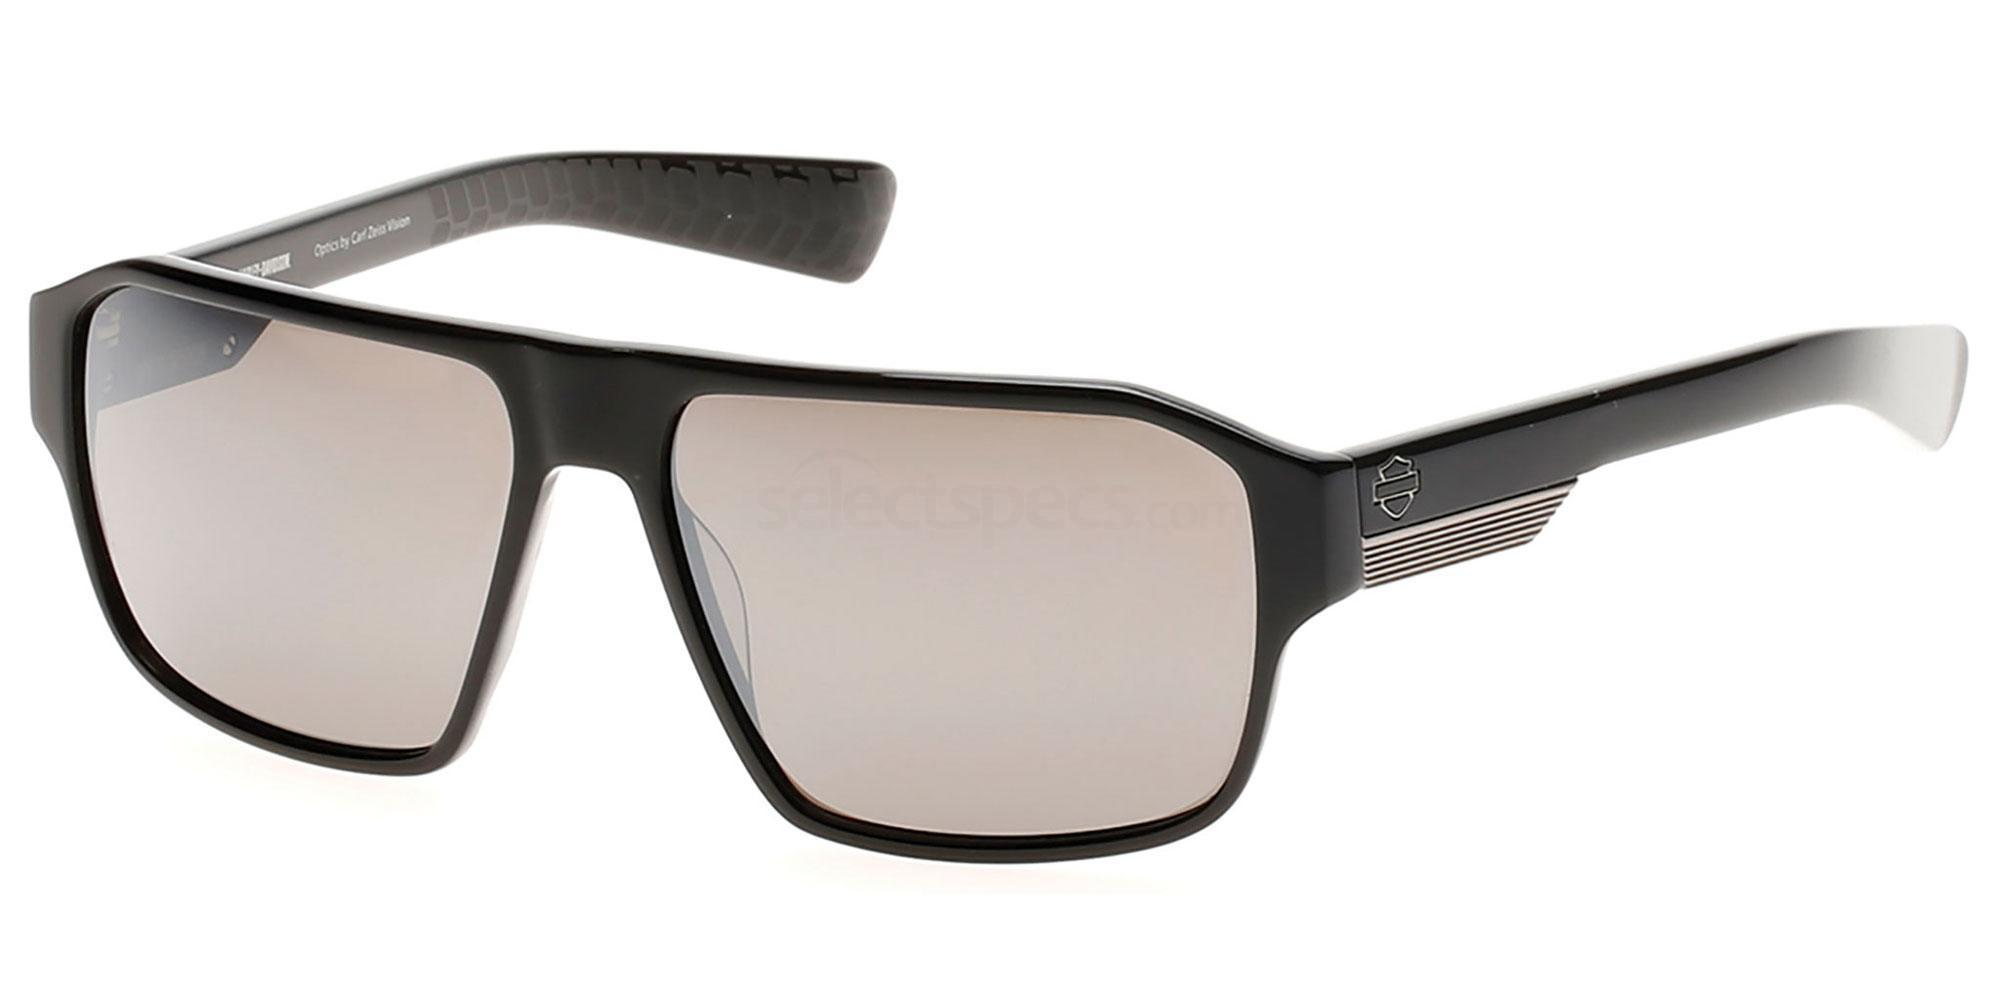 01A HD2008 Sunglasses, Harley Davidson